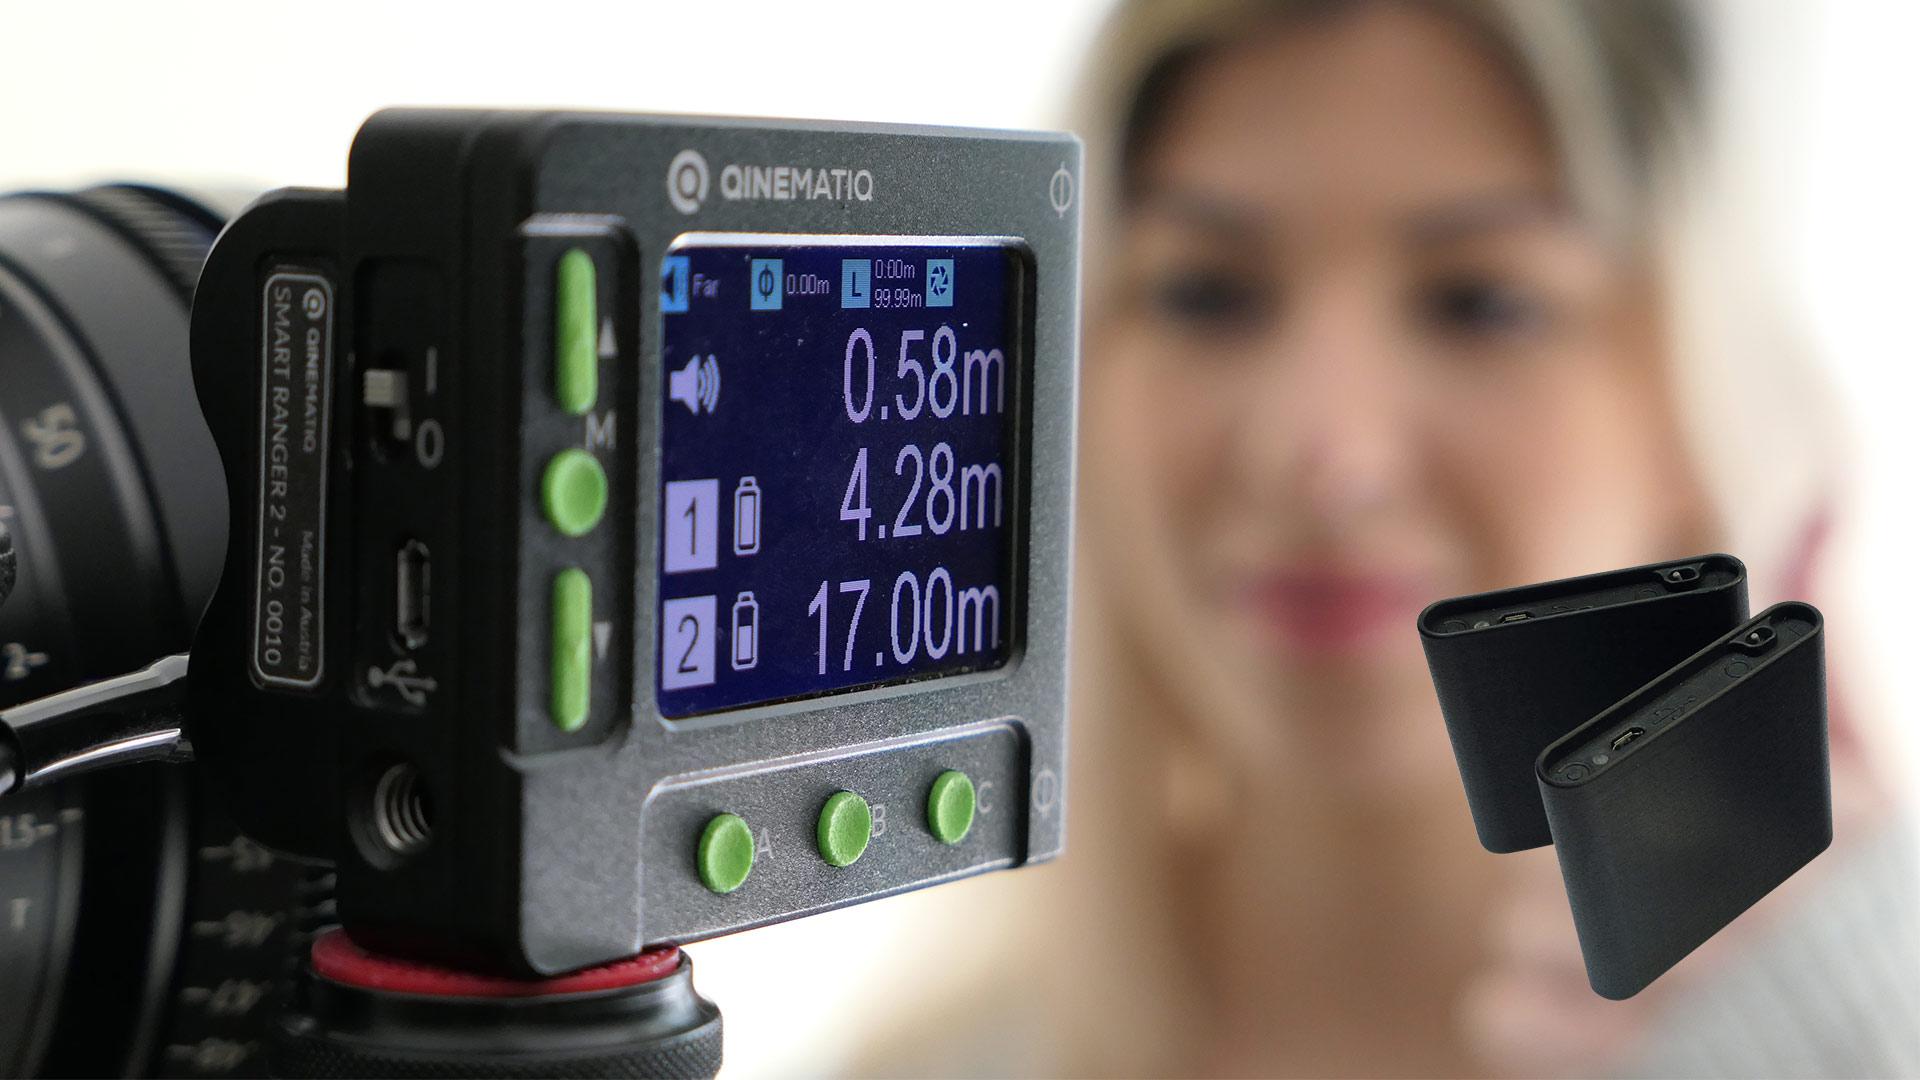 QinematiqがSmart Ranger 2を発売 - 3つの被写体を同時計測できるデジタル距離計